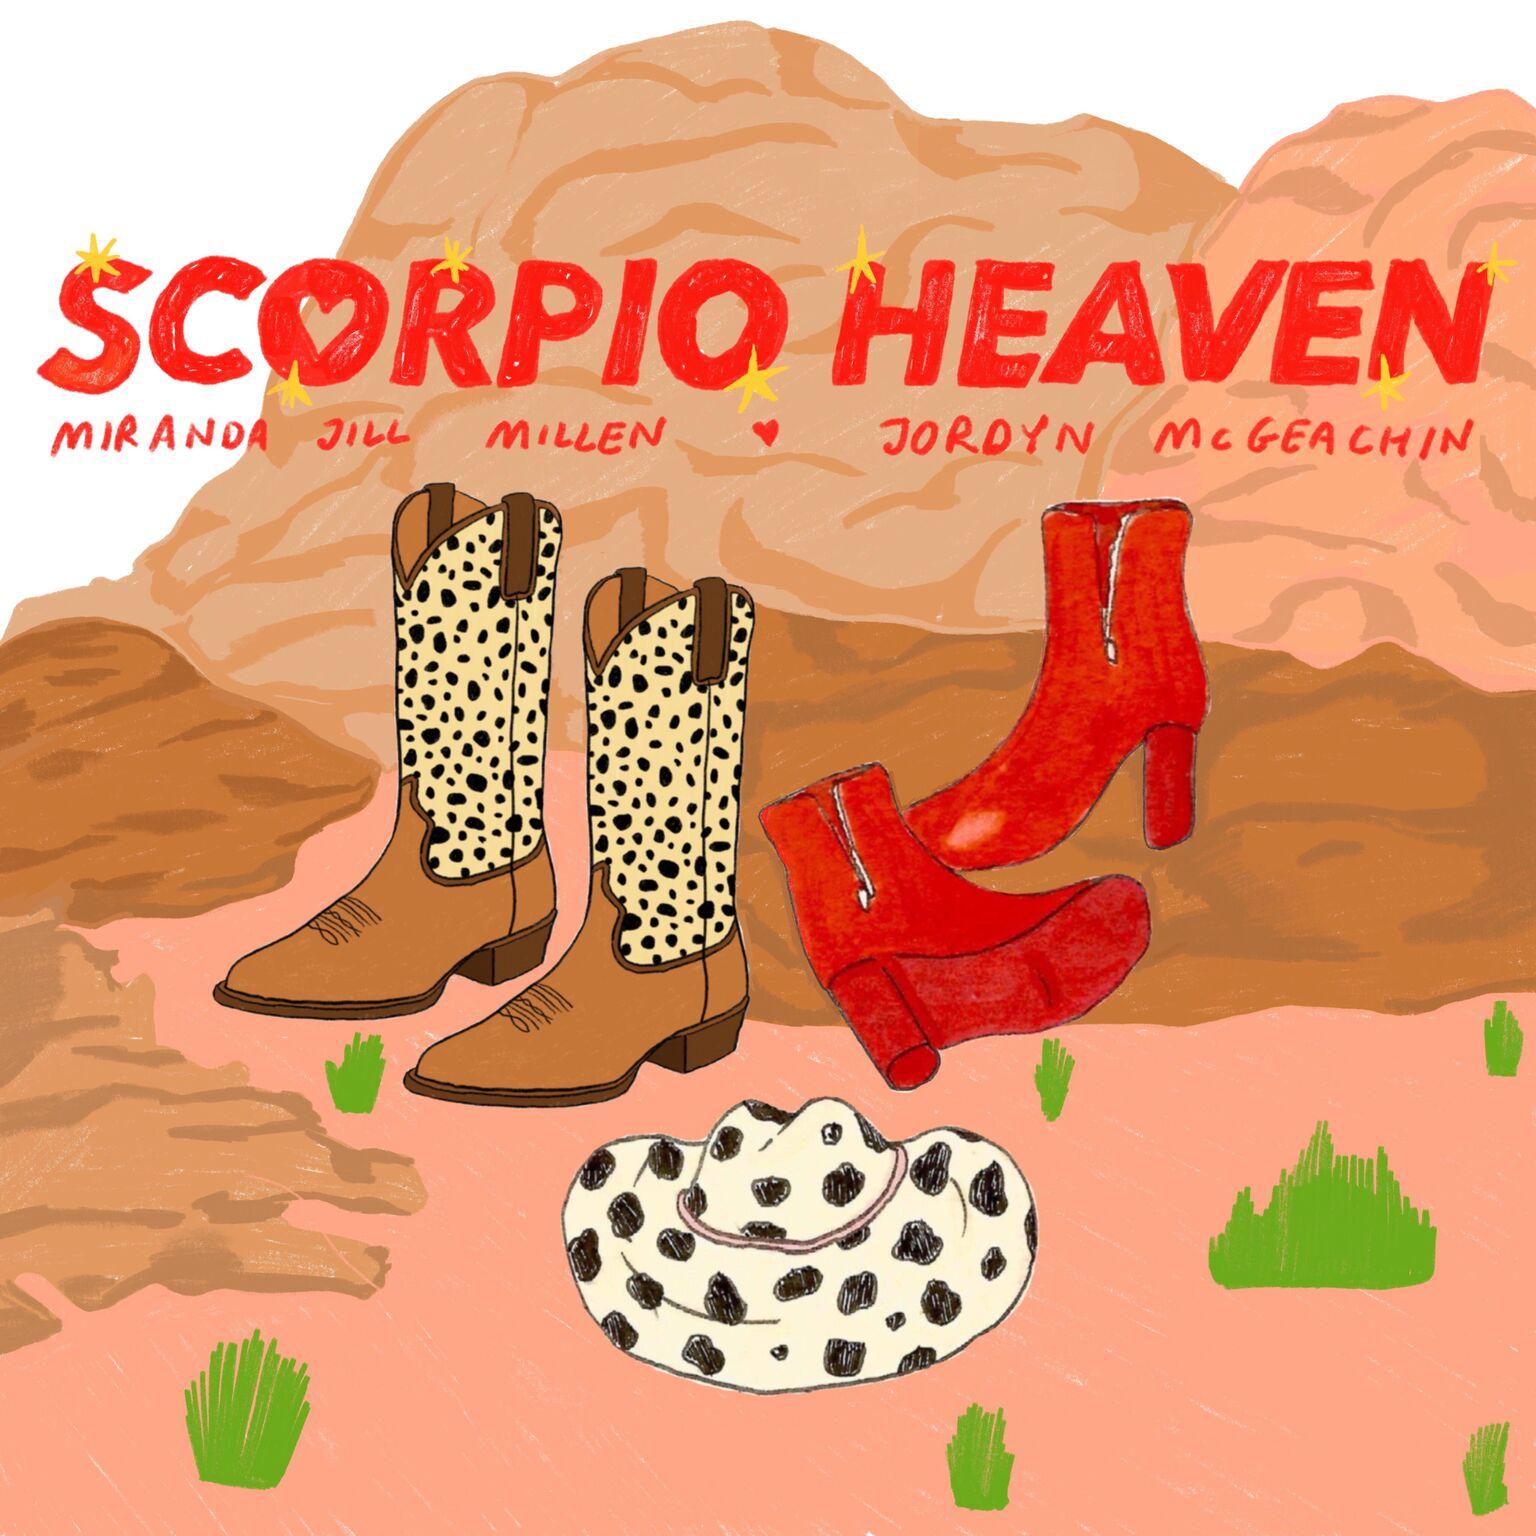 Scorpio-heaven-Mirandajmillen-fromjordyn-tinningstreet-interview.jpeg